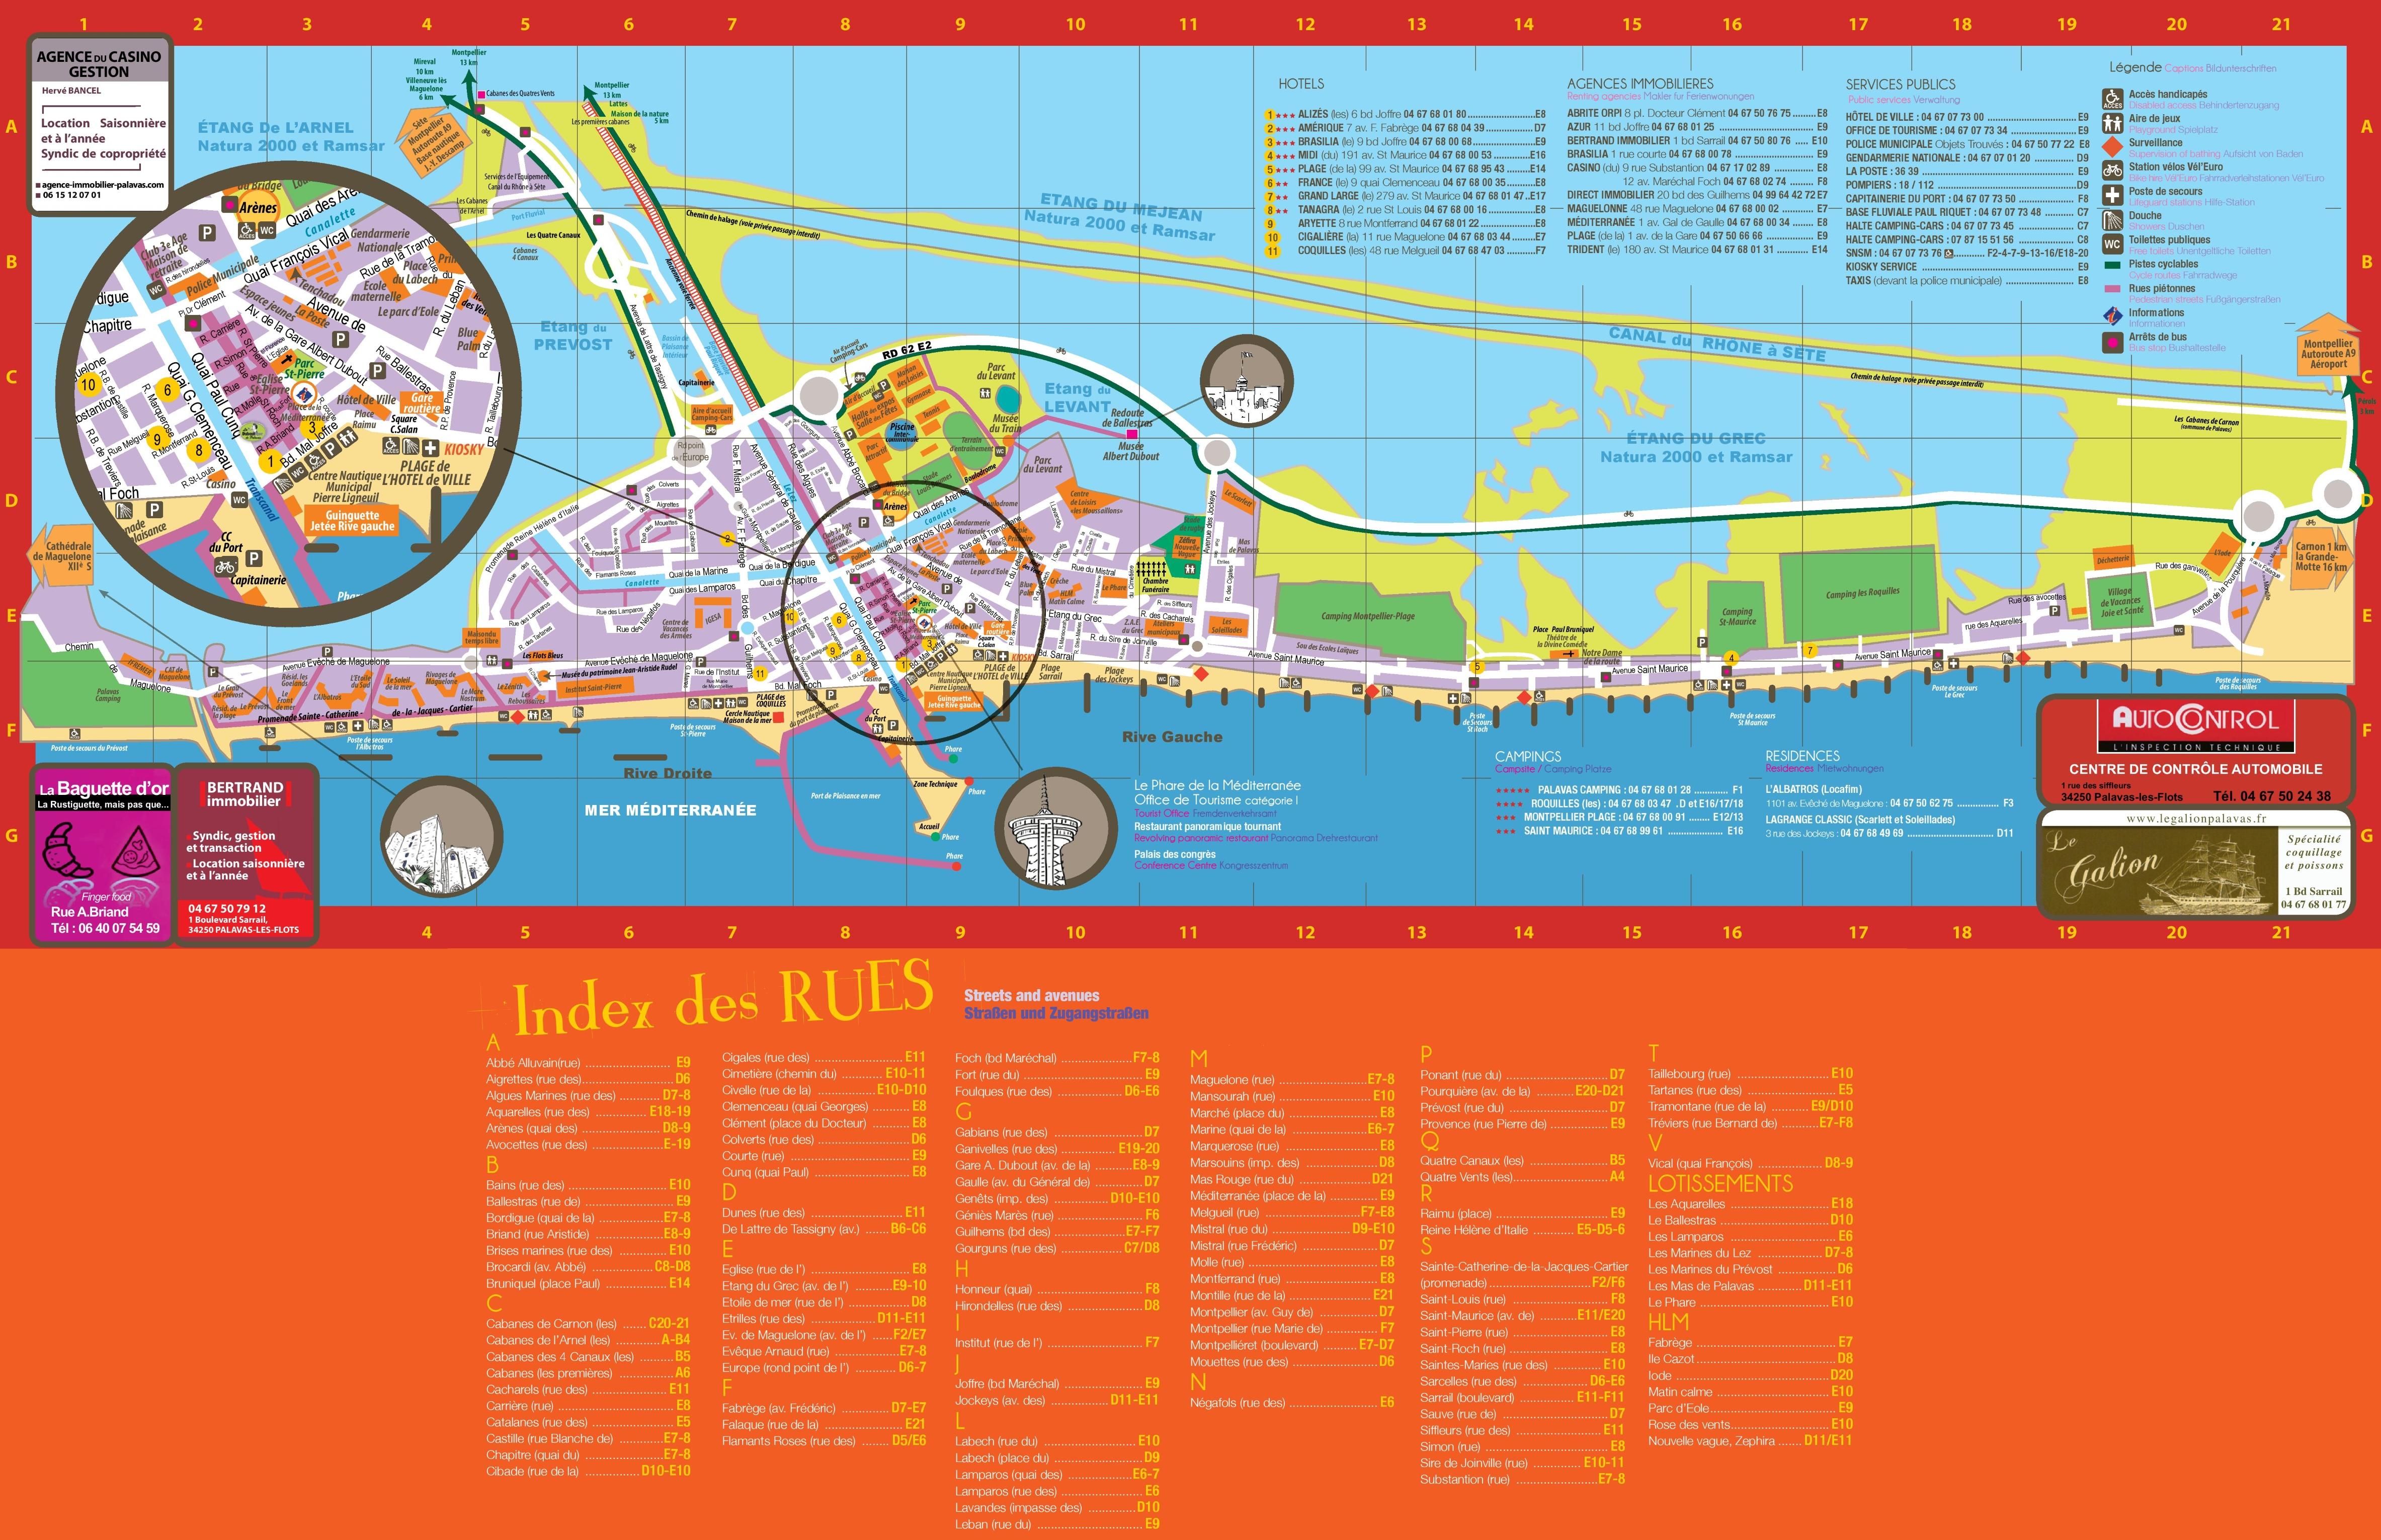 PalavaslesFlots tourist map